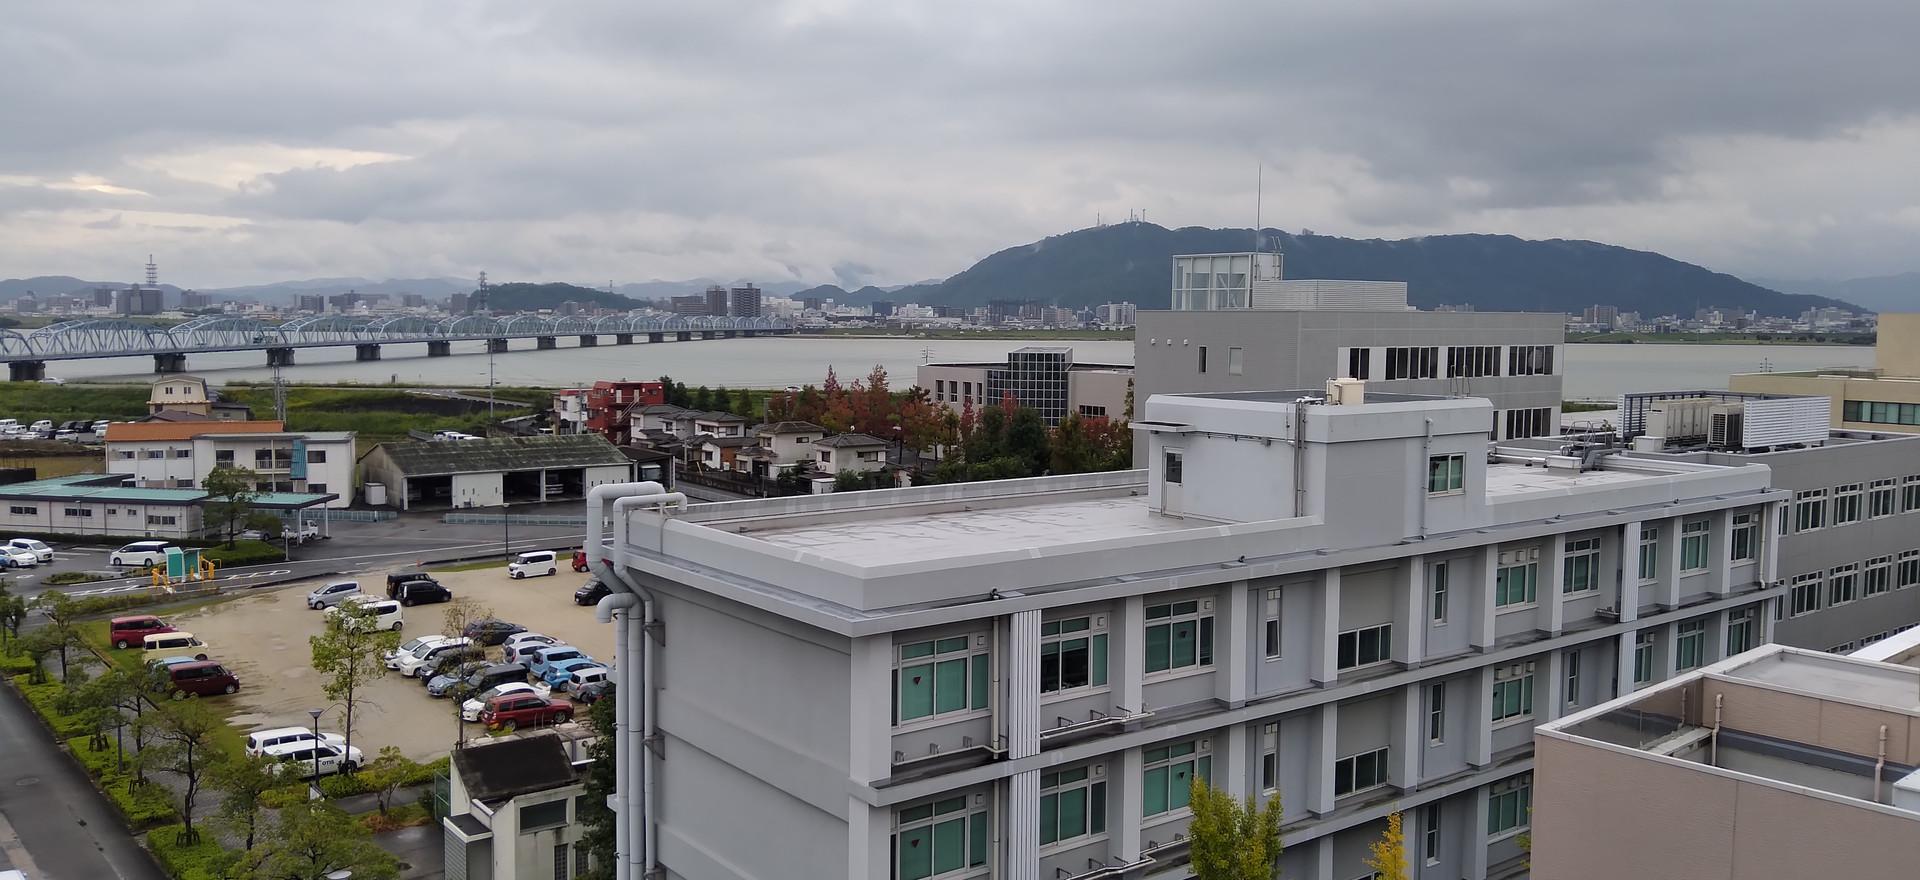 Kamiyama town, Japan